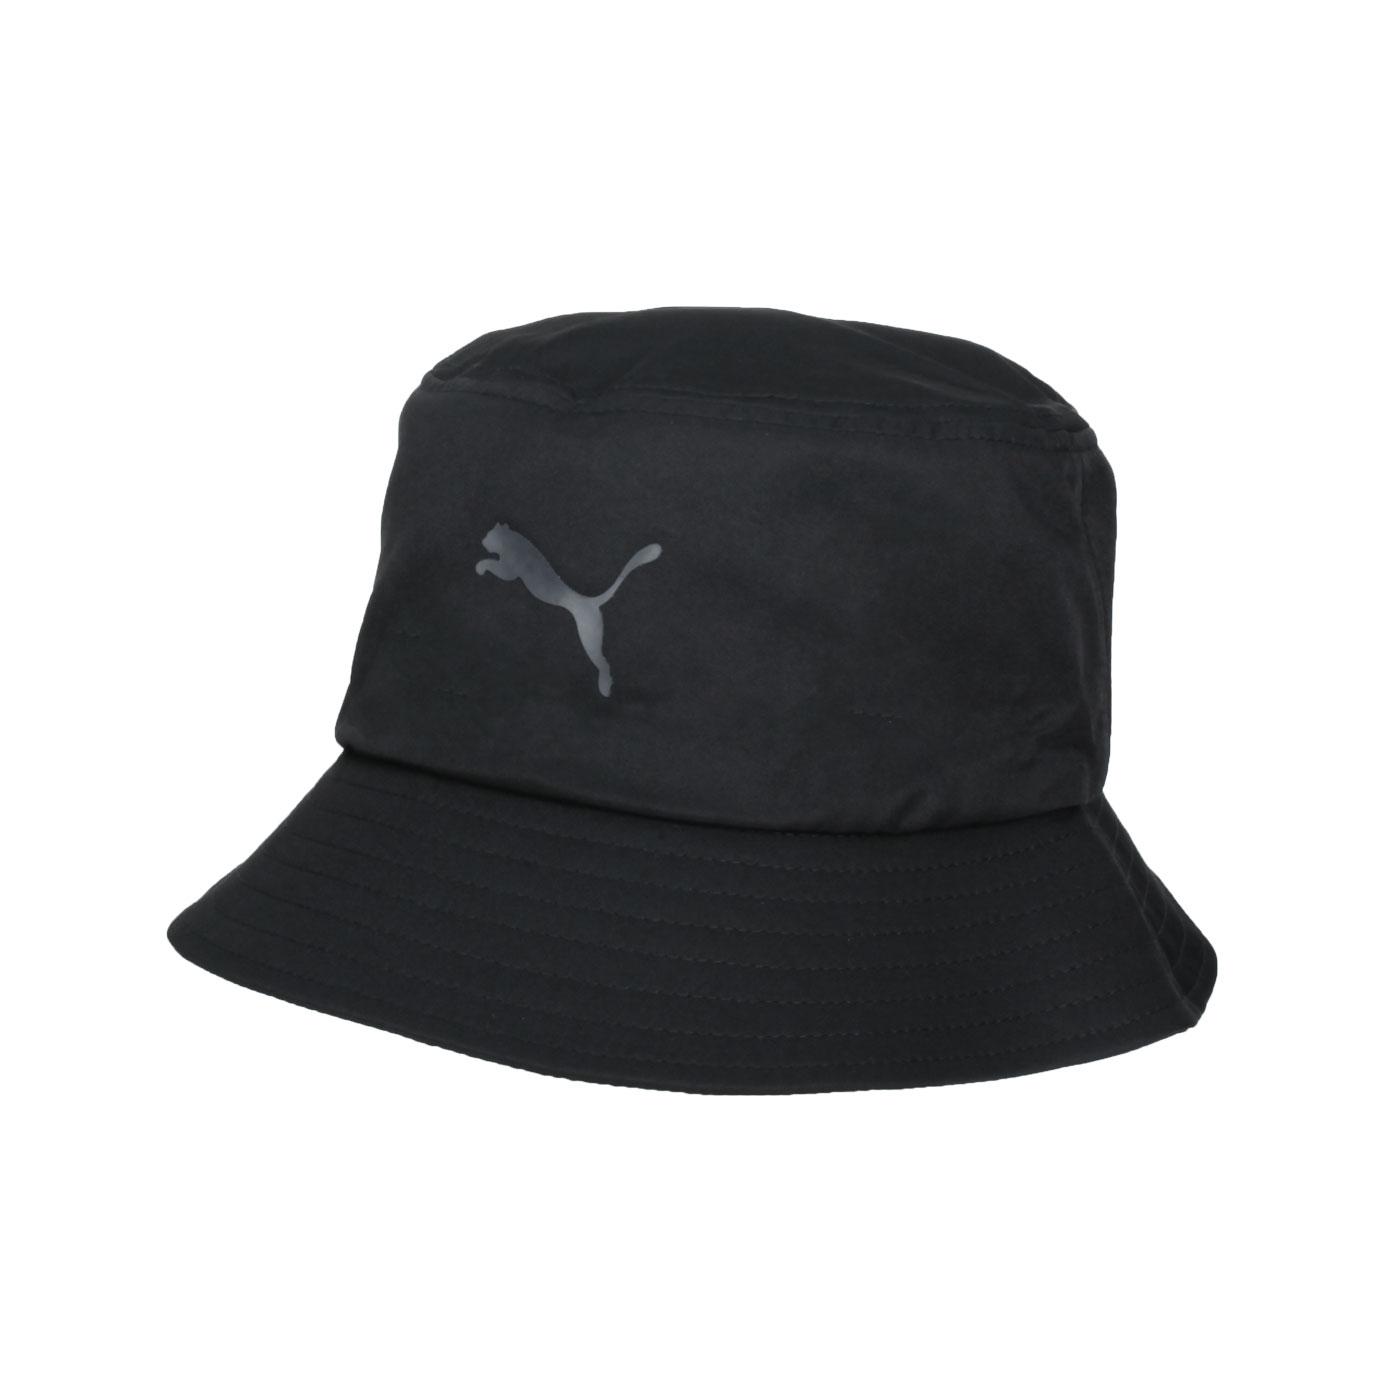 PUMA 漁夫帽 02313101 - 黑灰